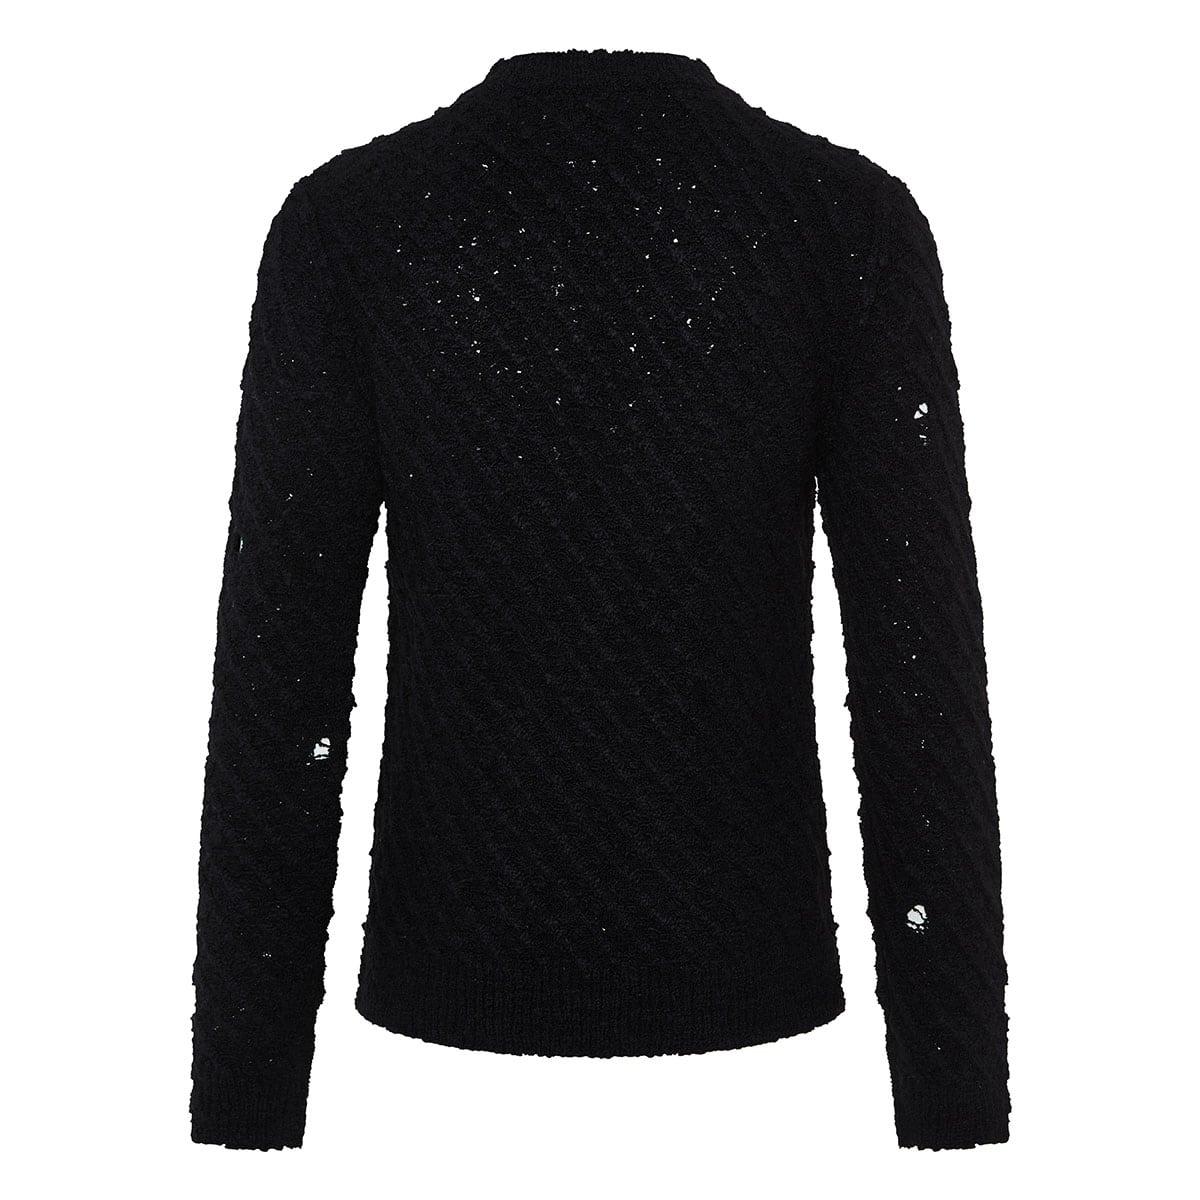 Ripped wool sweater